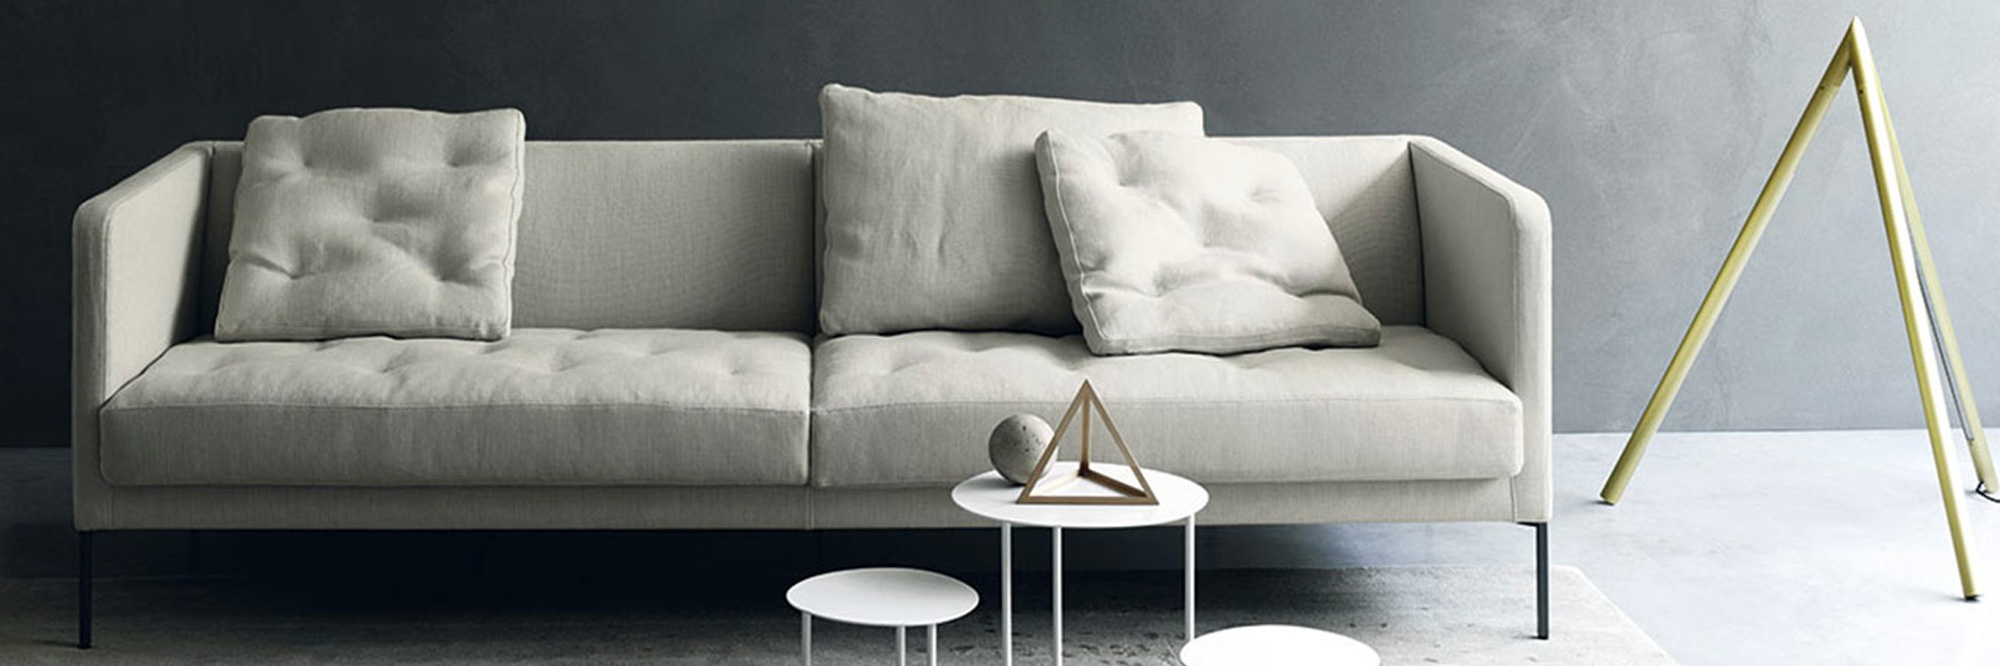 Colombo Divani A Meda lissoni & partners   product   living divani   easy lipp